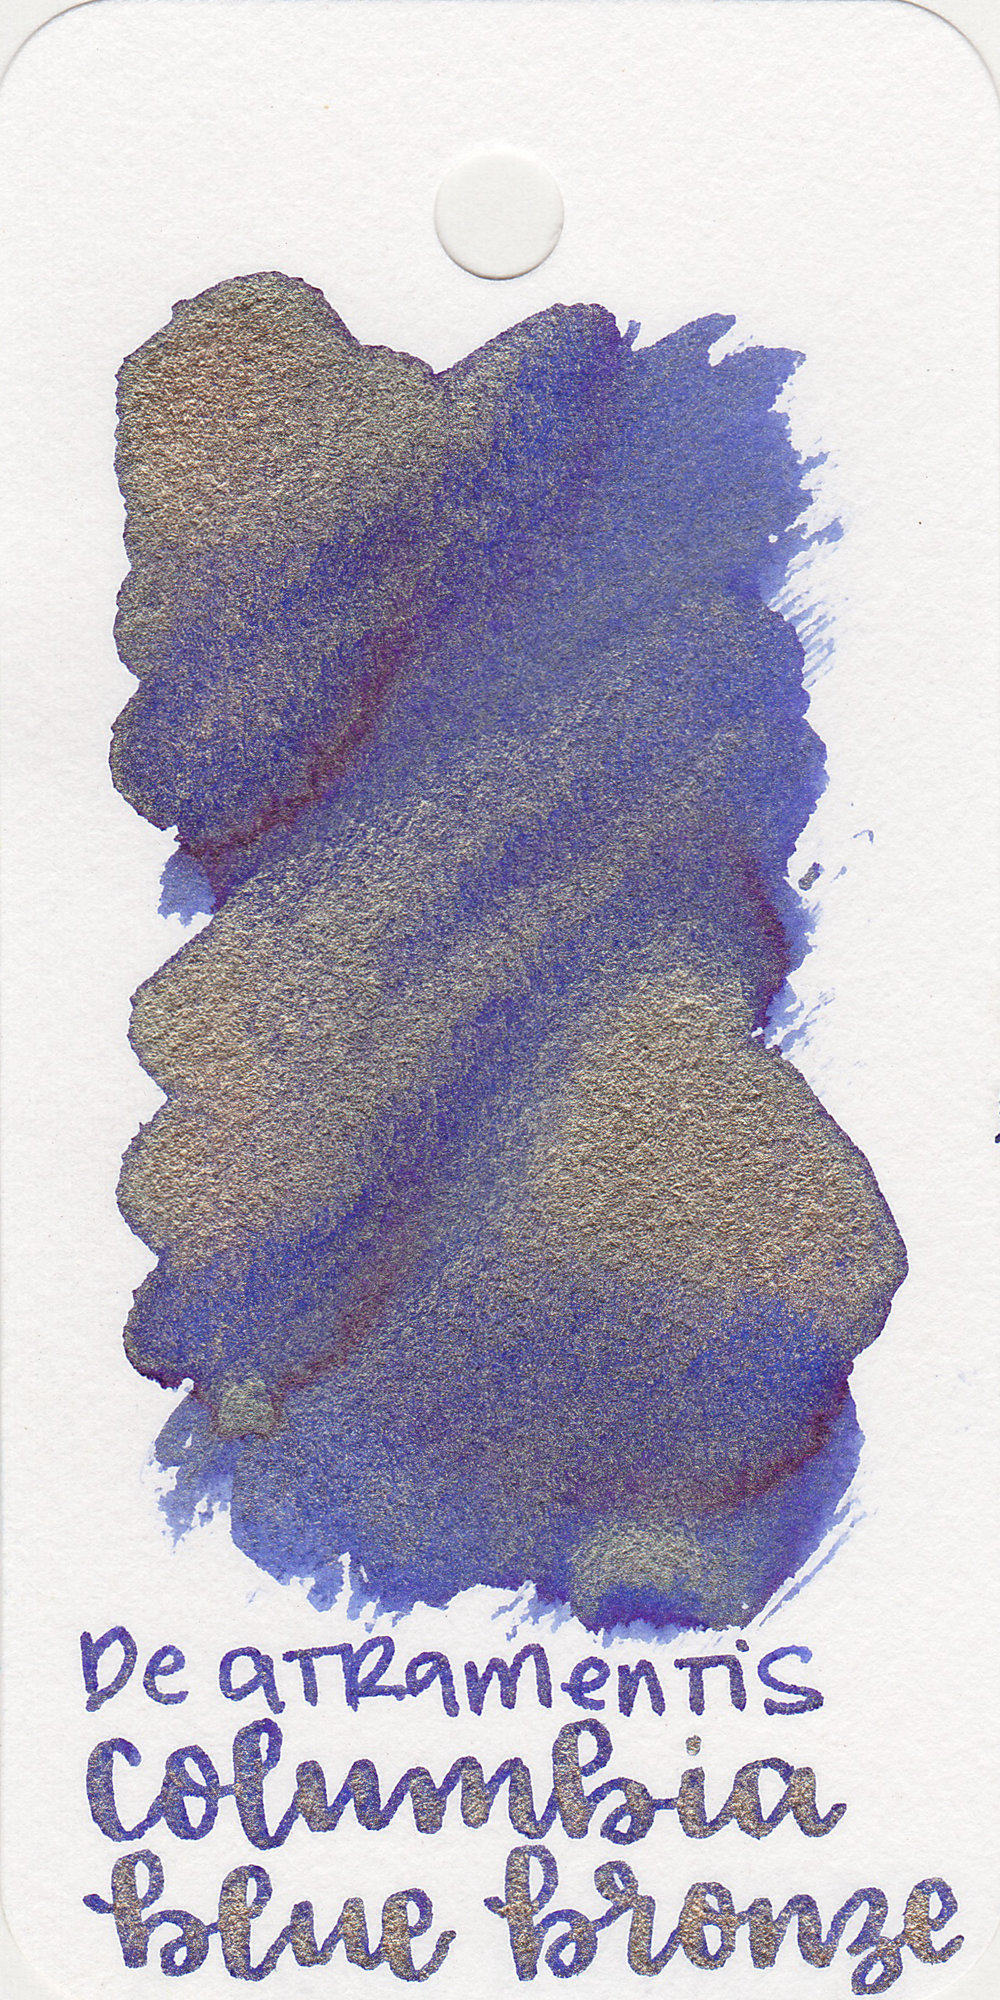 da-columbia-blue-bronze-1.jpg